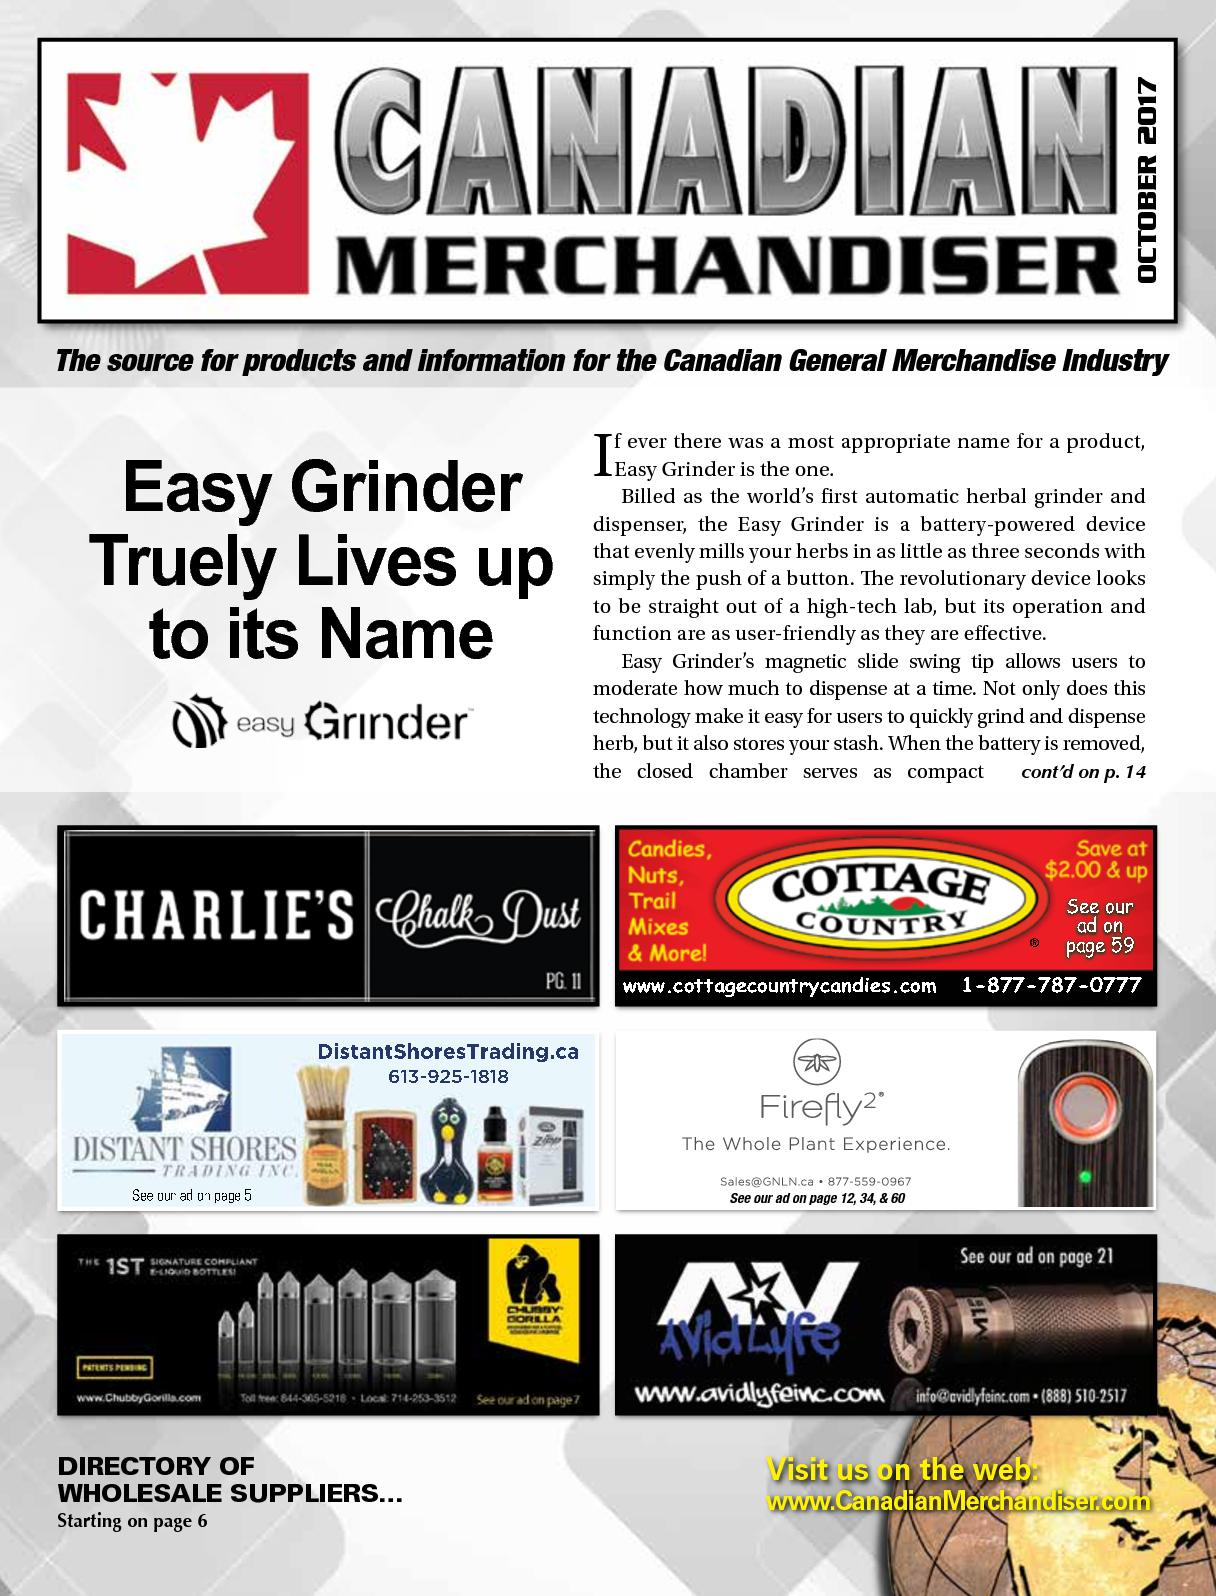 Calamo Canadian Merchandiser Oct2017 Elenco Snap Circuits Light The Granville Island Toy Company